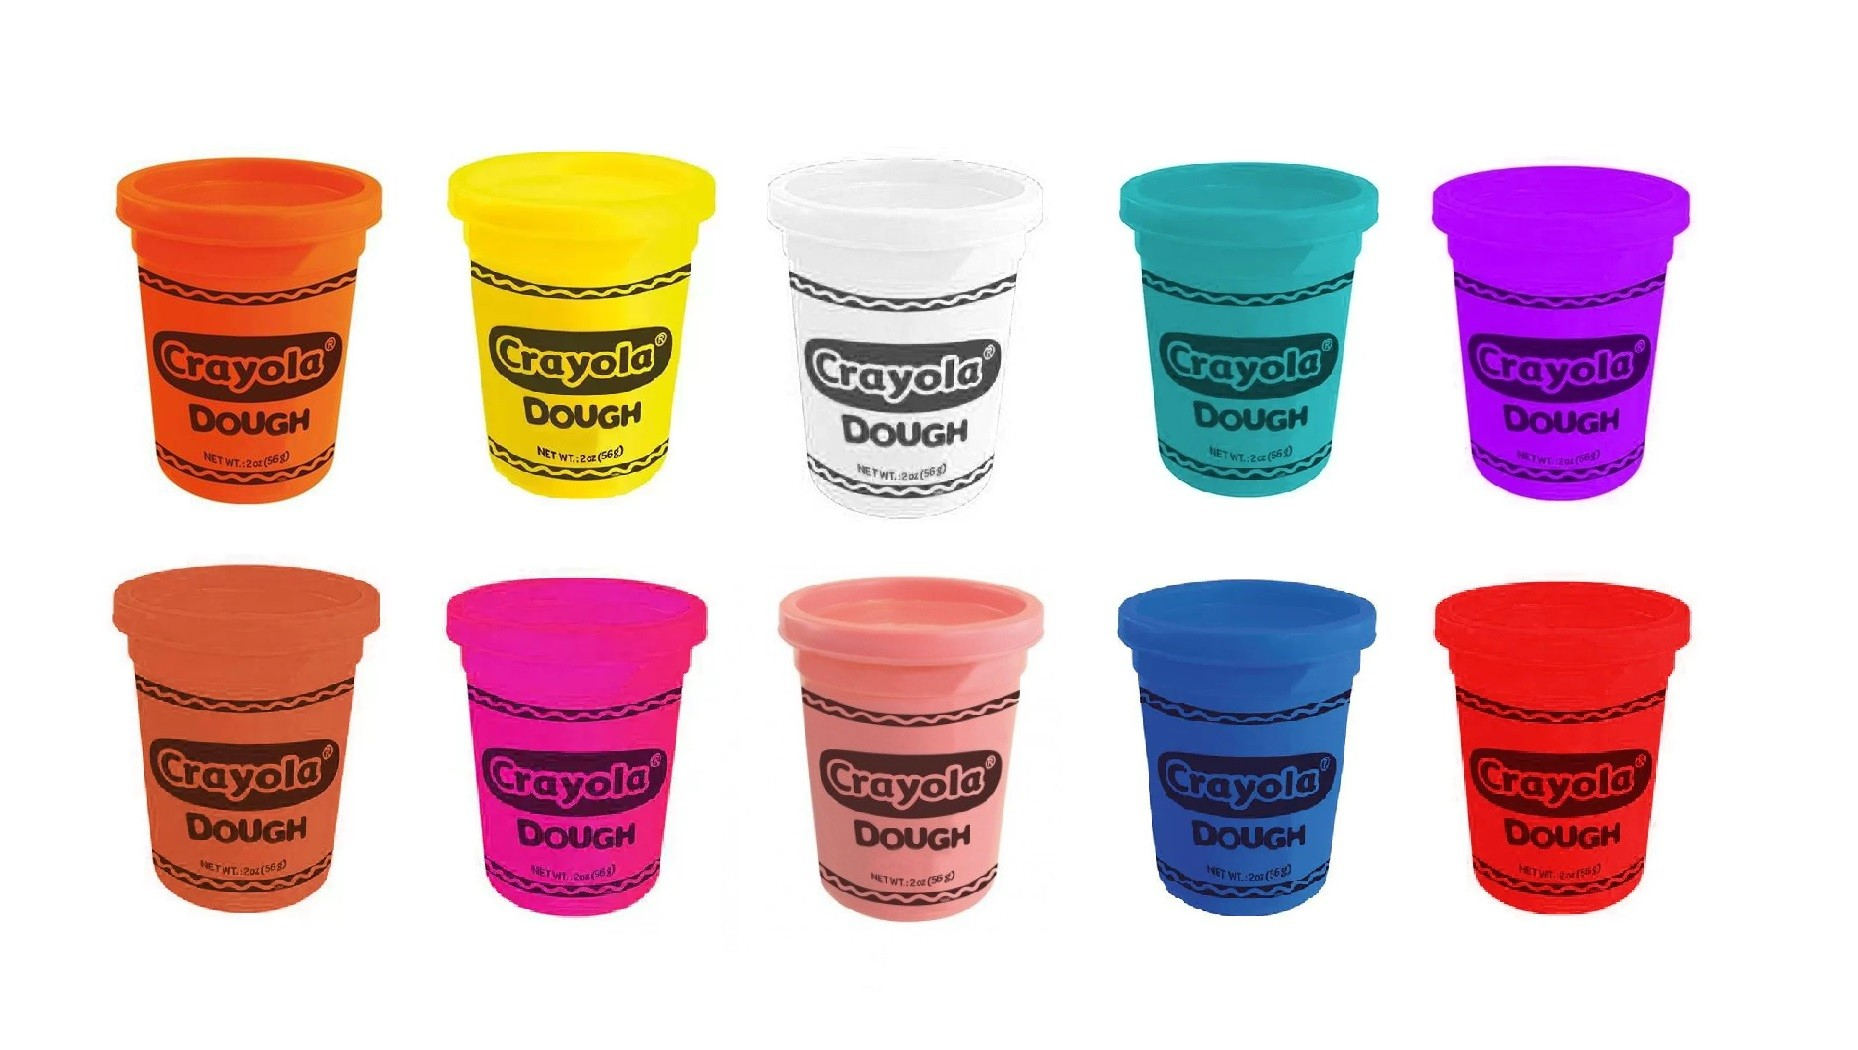 Kit Massa de Modelar Crayola 10 cores Multikids 10 potes de 56g  - Mix Eletro